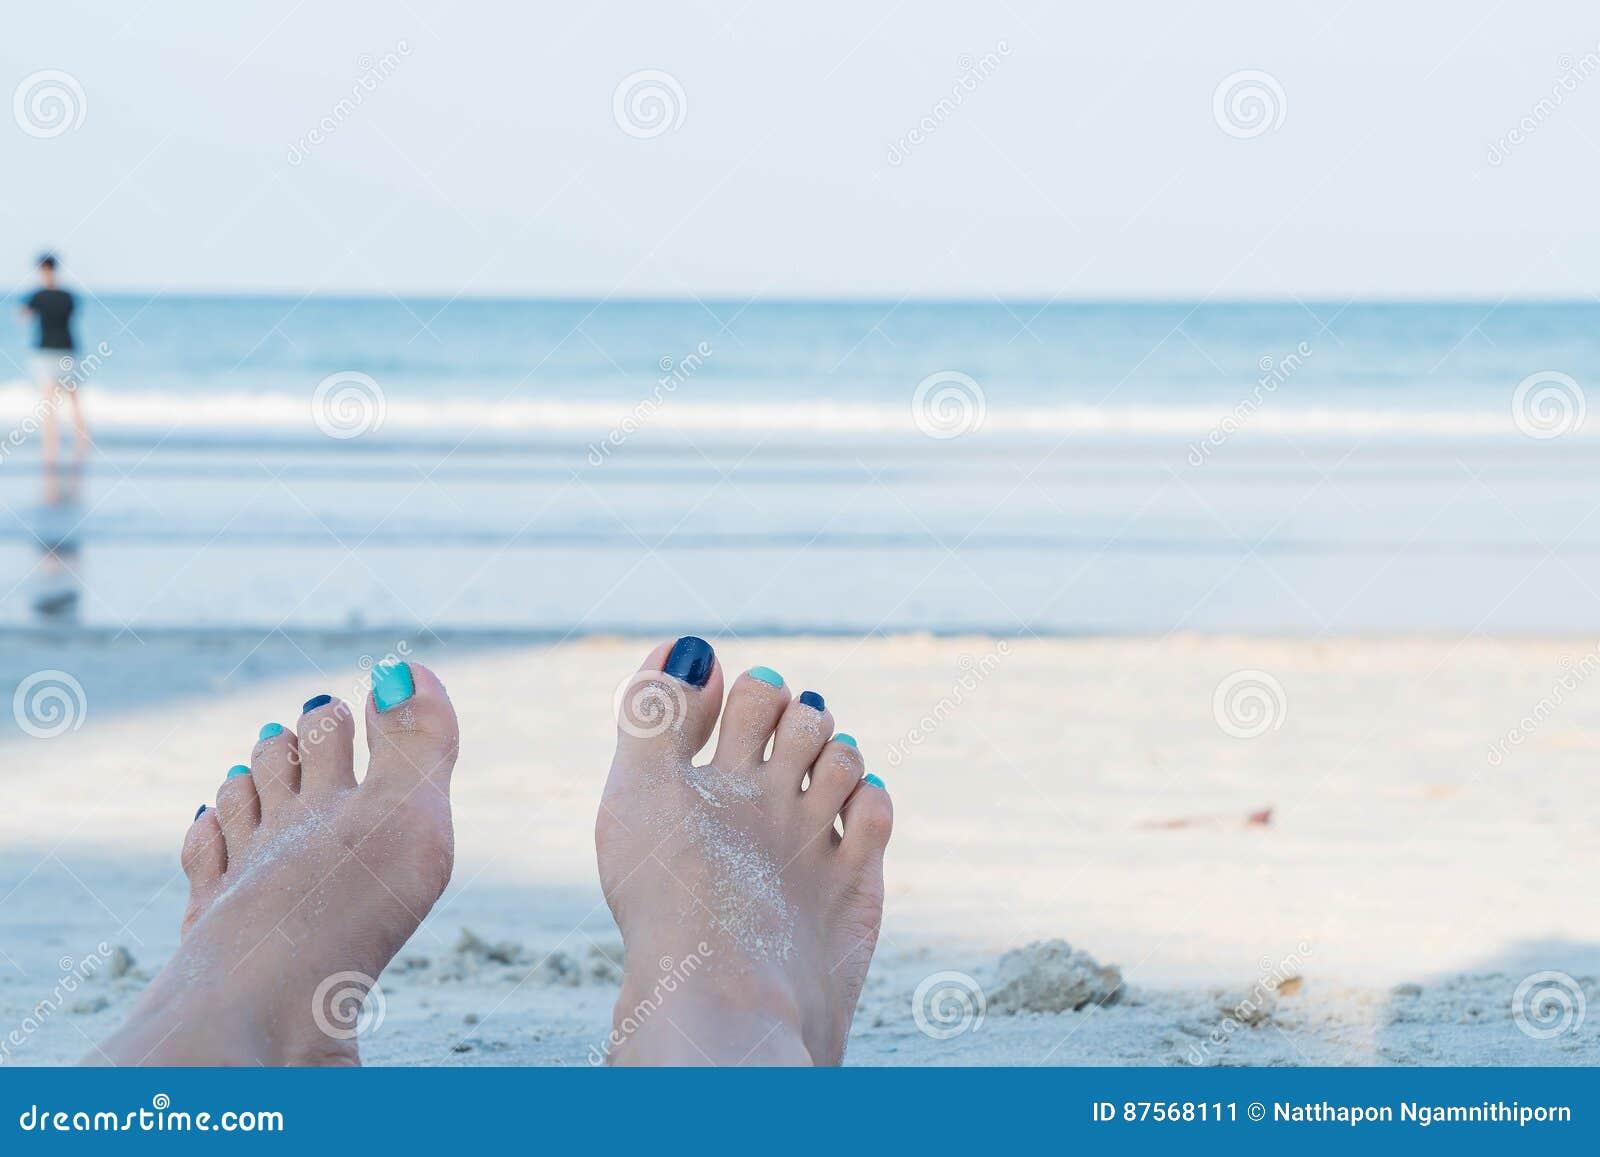 Крупный план на пляже фото фото 263-672